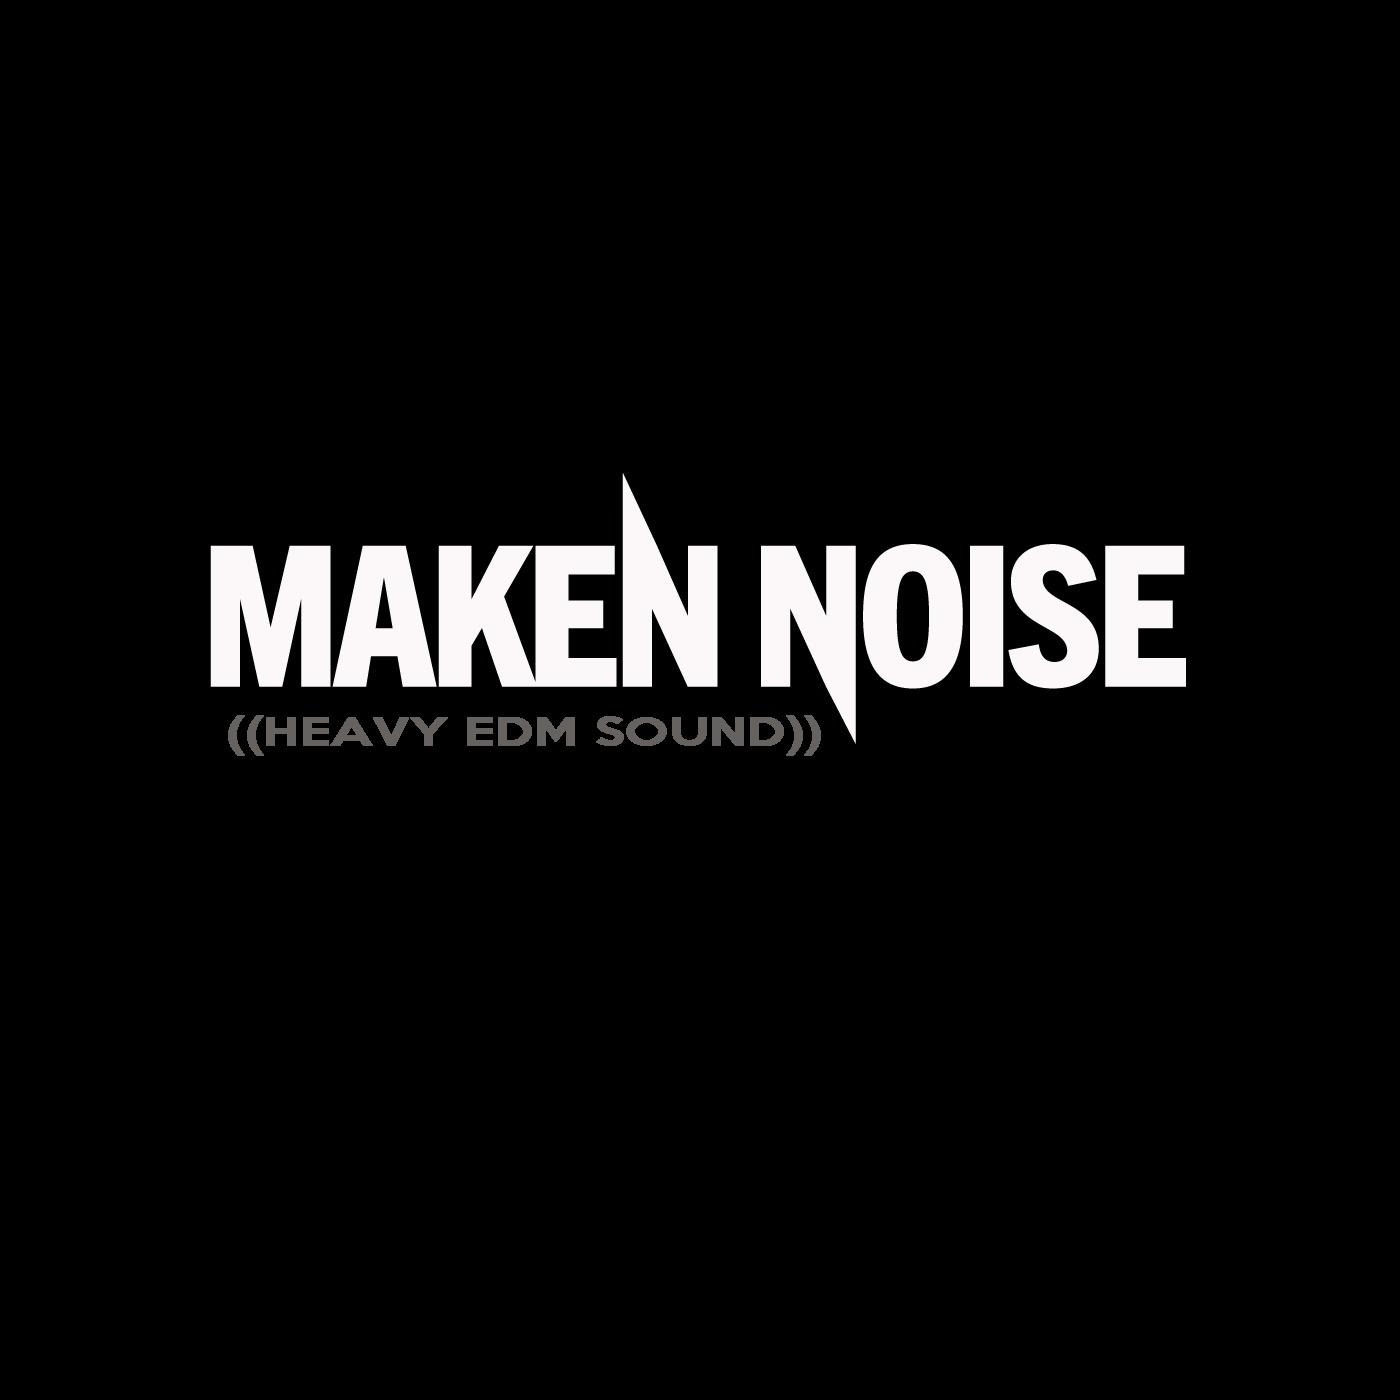 Maken Noise's ((HEAVY EDM SOUND)) Podcast